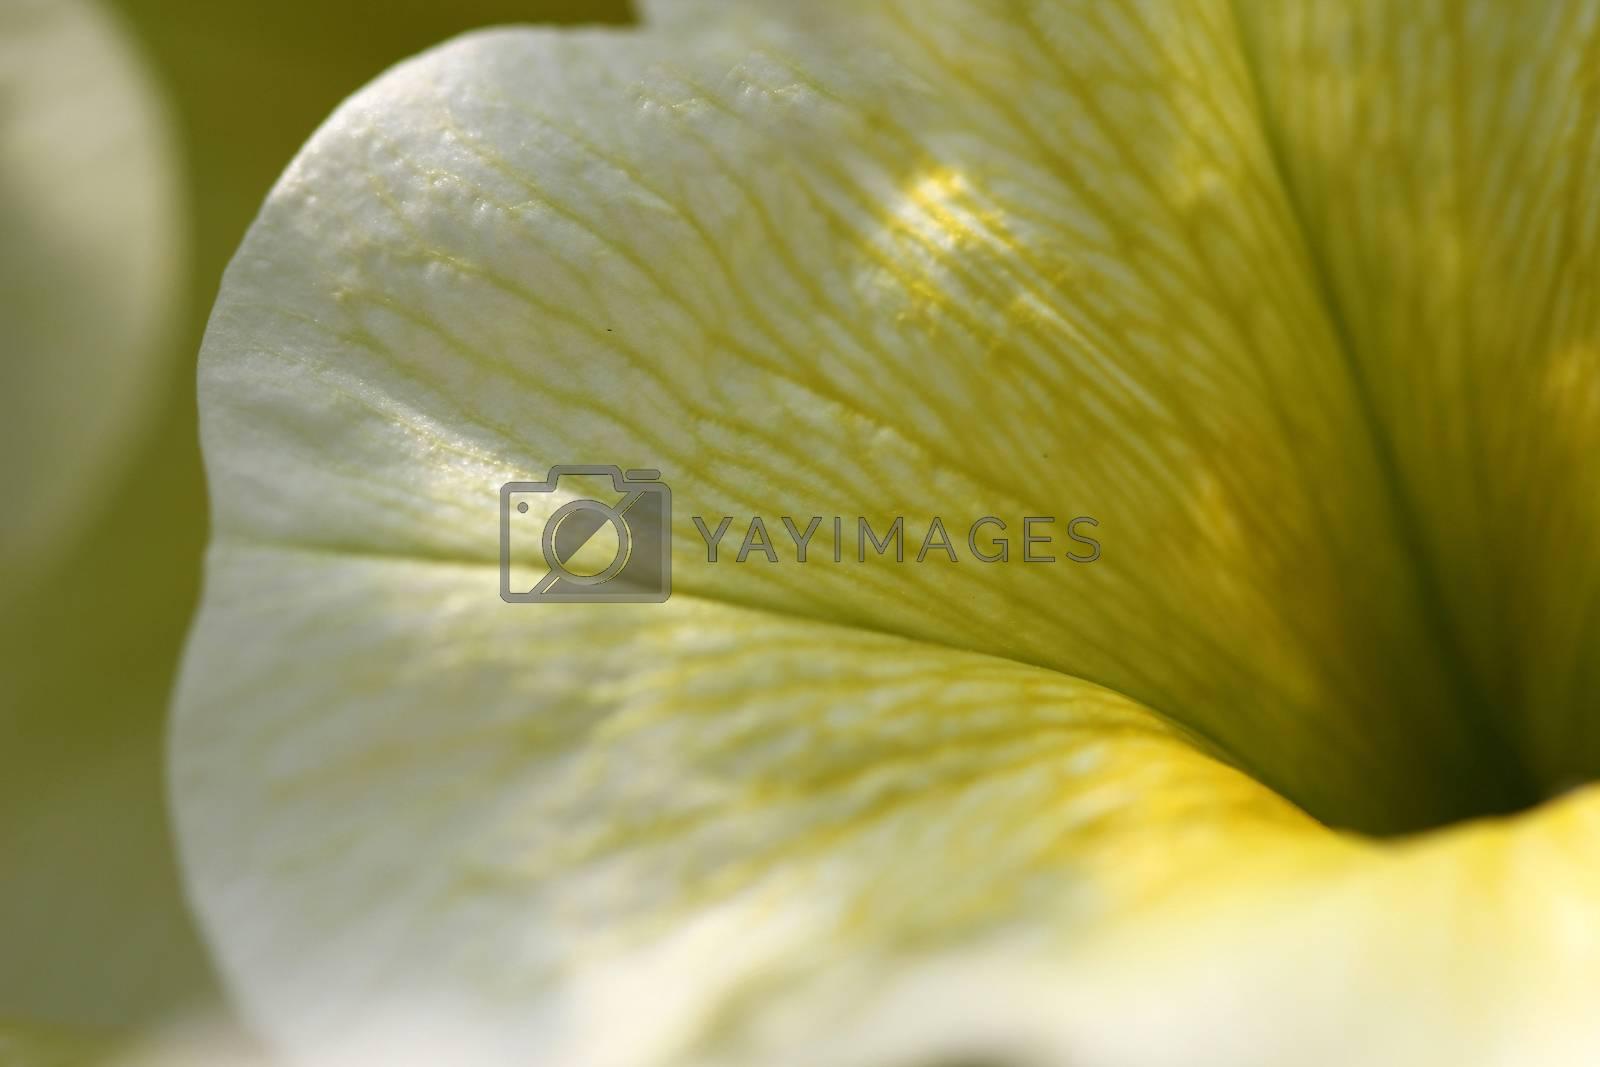 Royalty free image of Yellow Petunia by Catmando